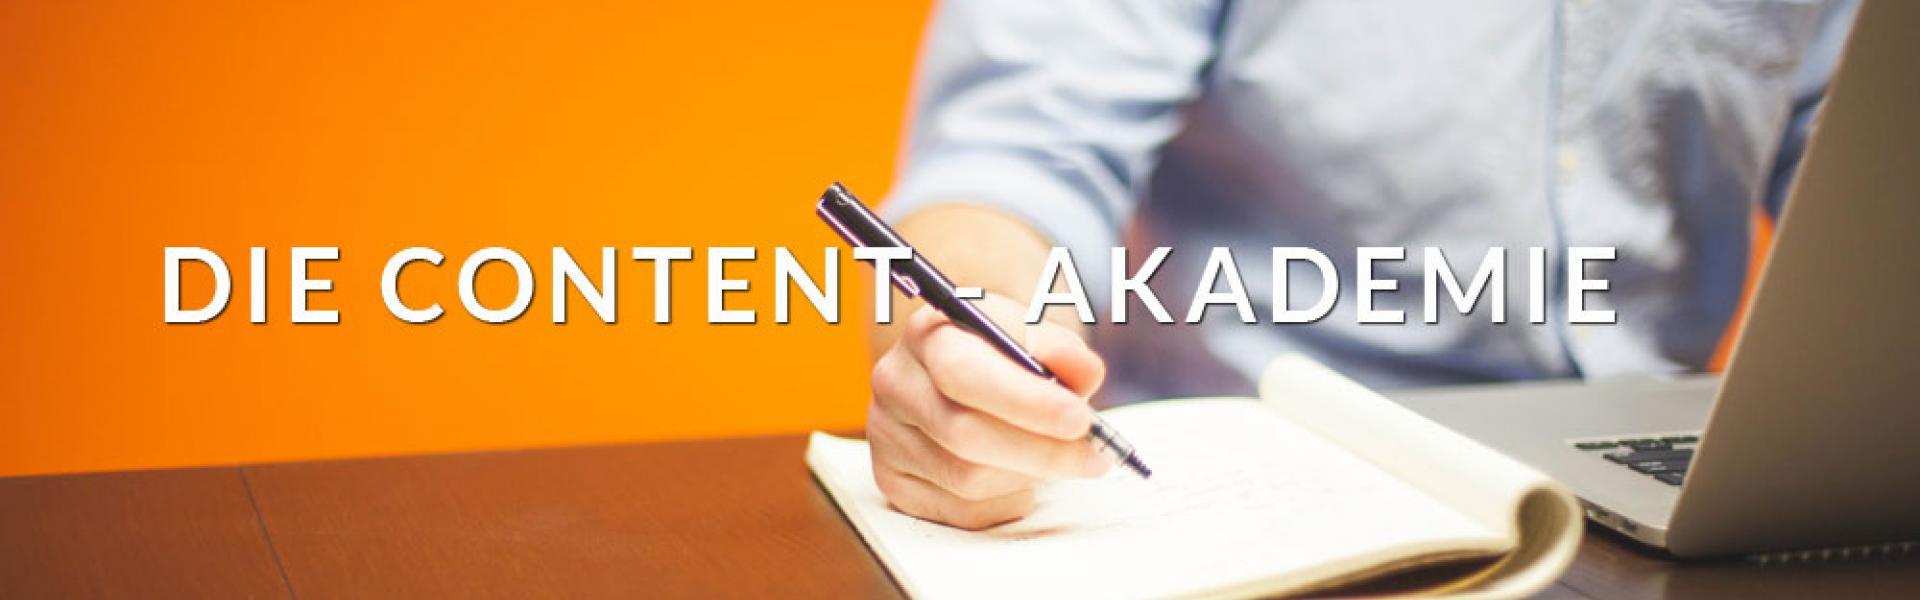 Die Content-Akademie cover